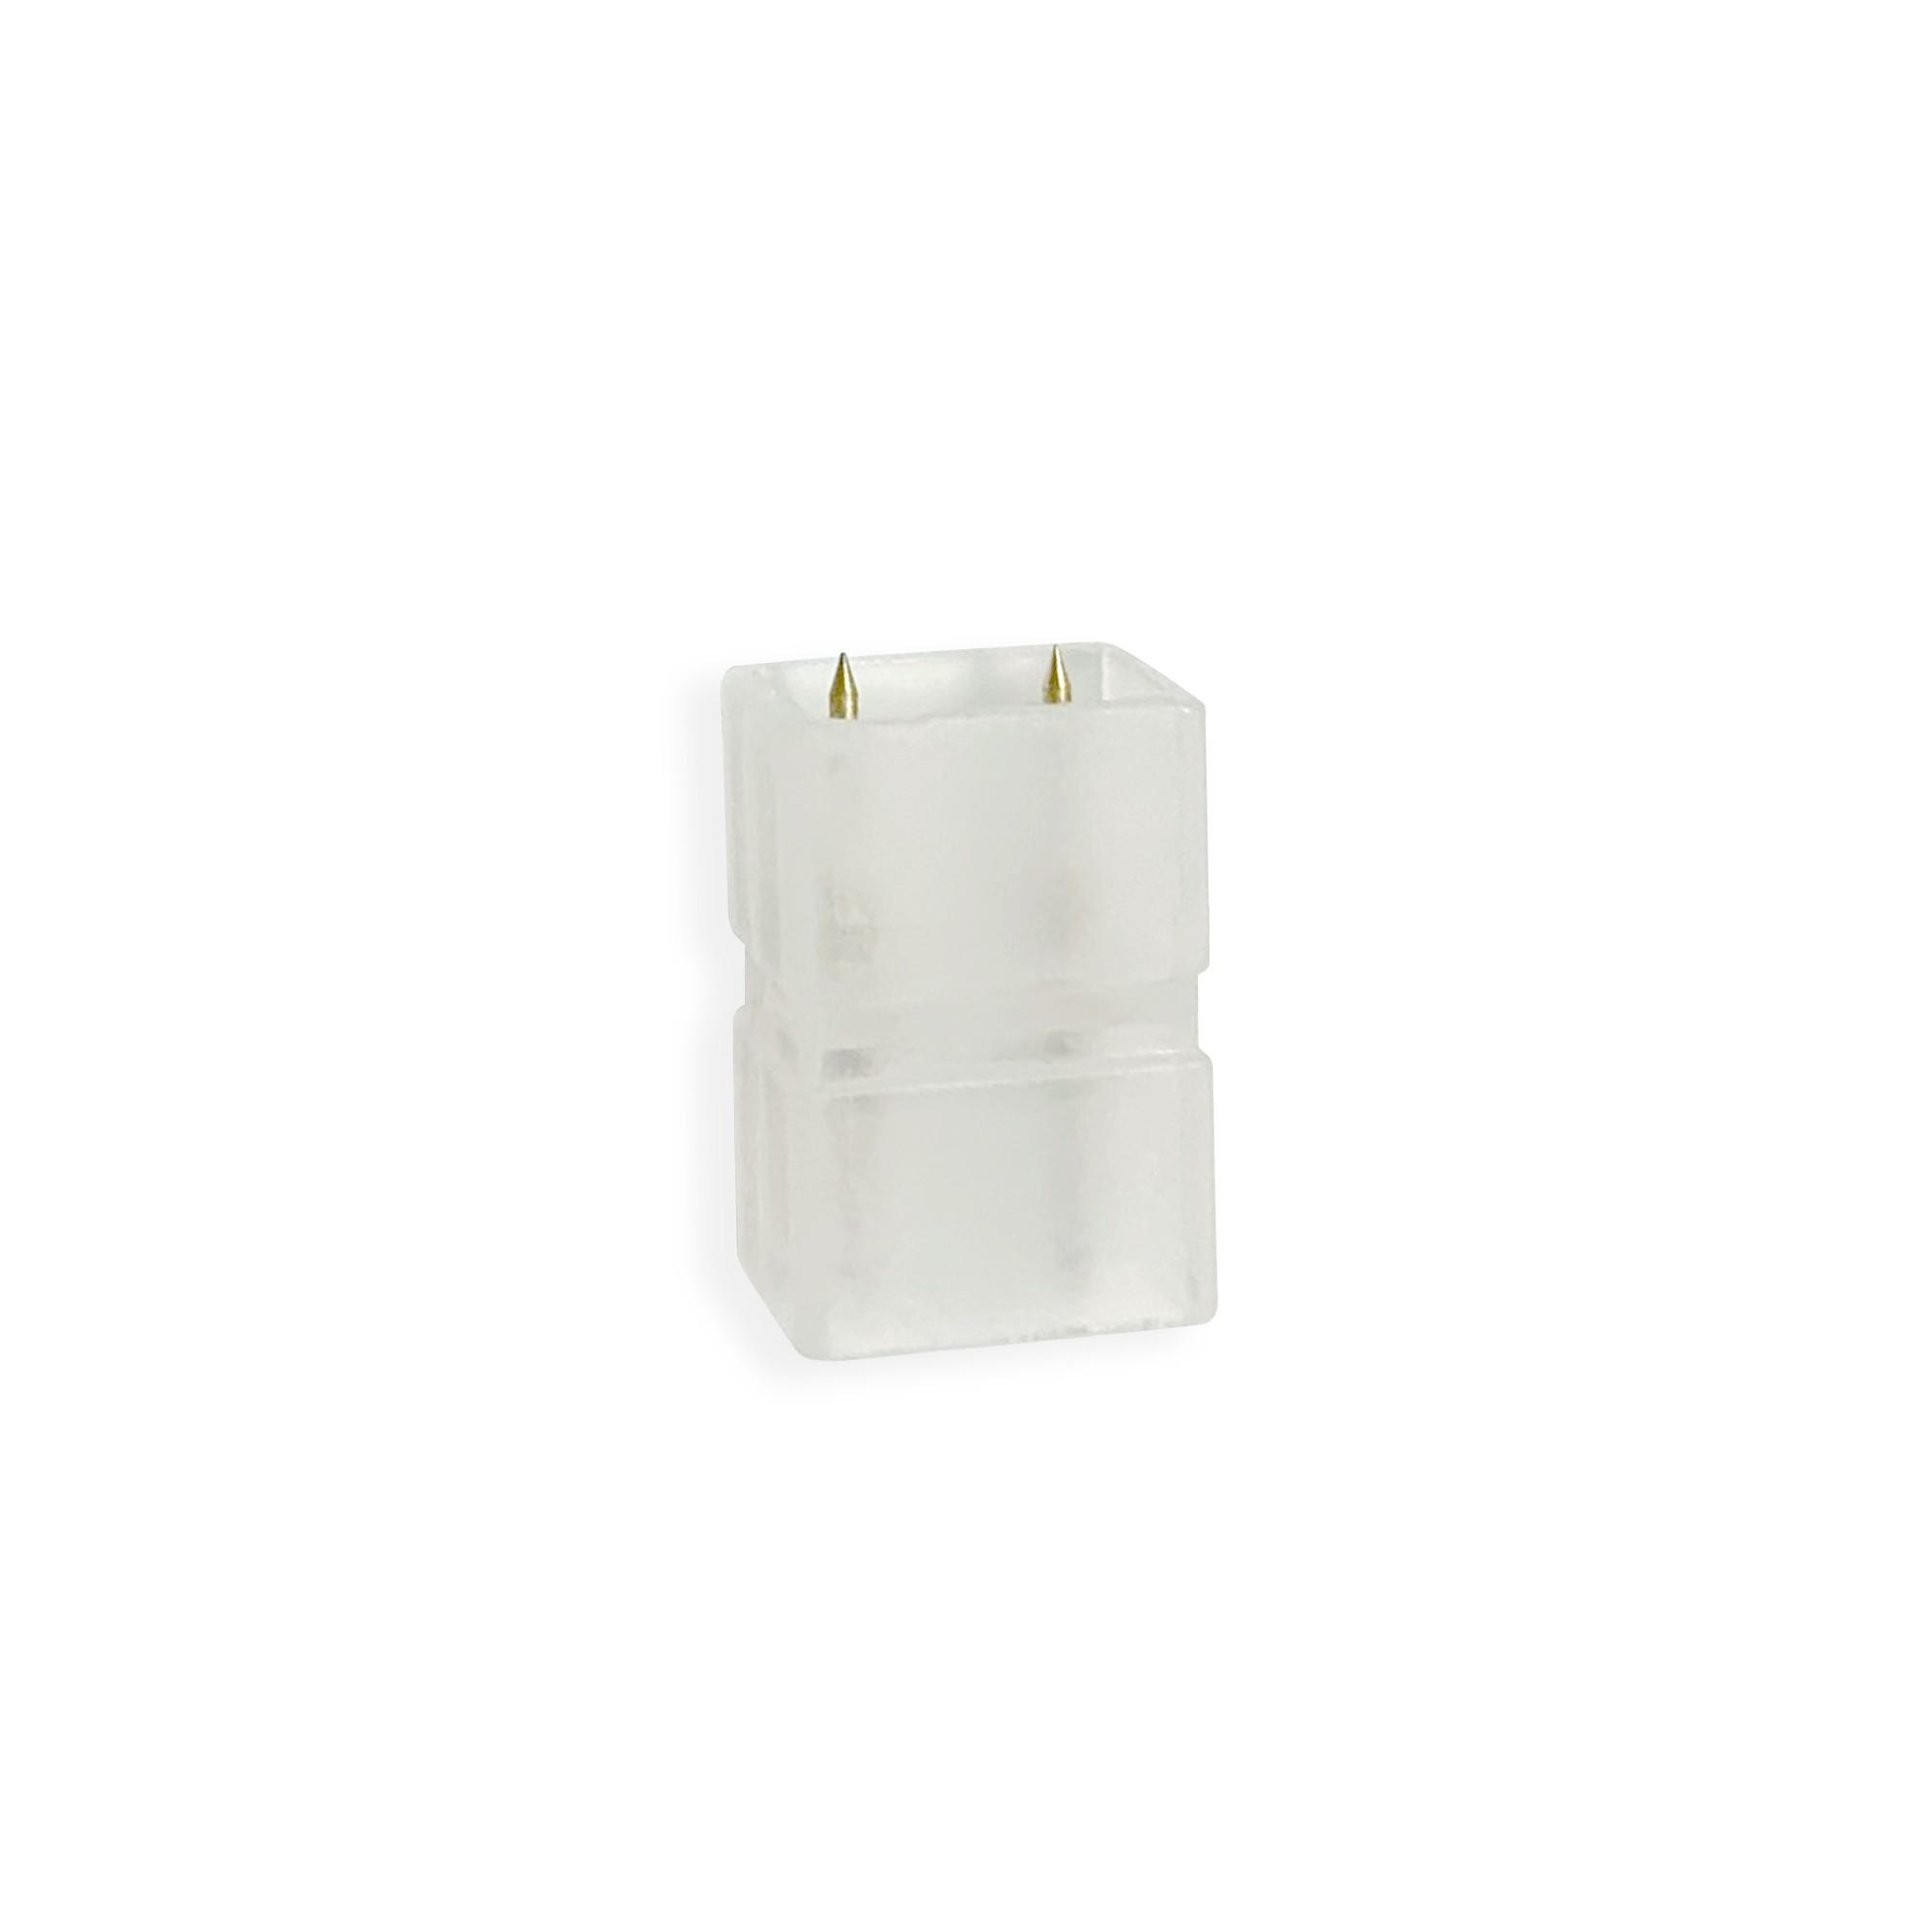 Переходник для ленты 220V 5050 PSL-14 (10pkt)